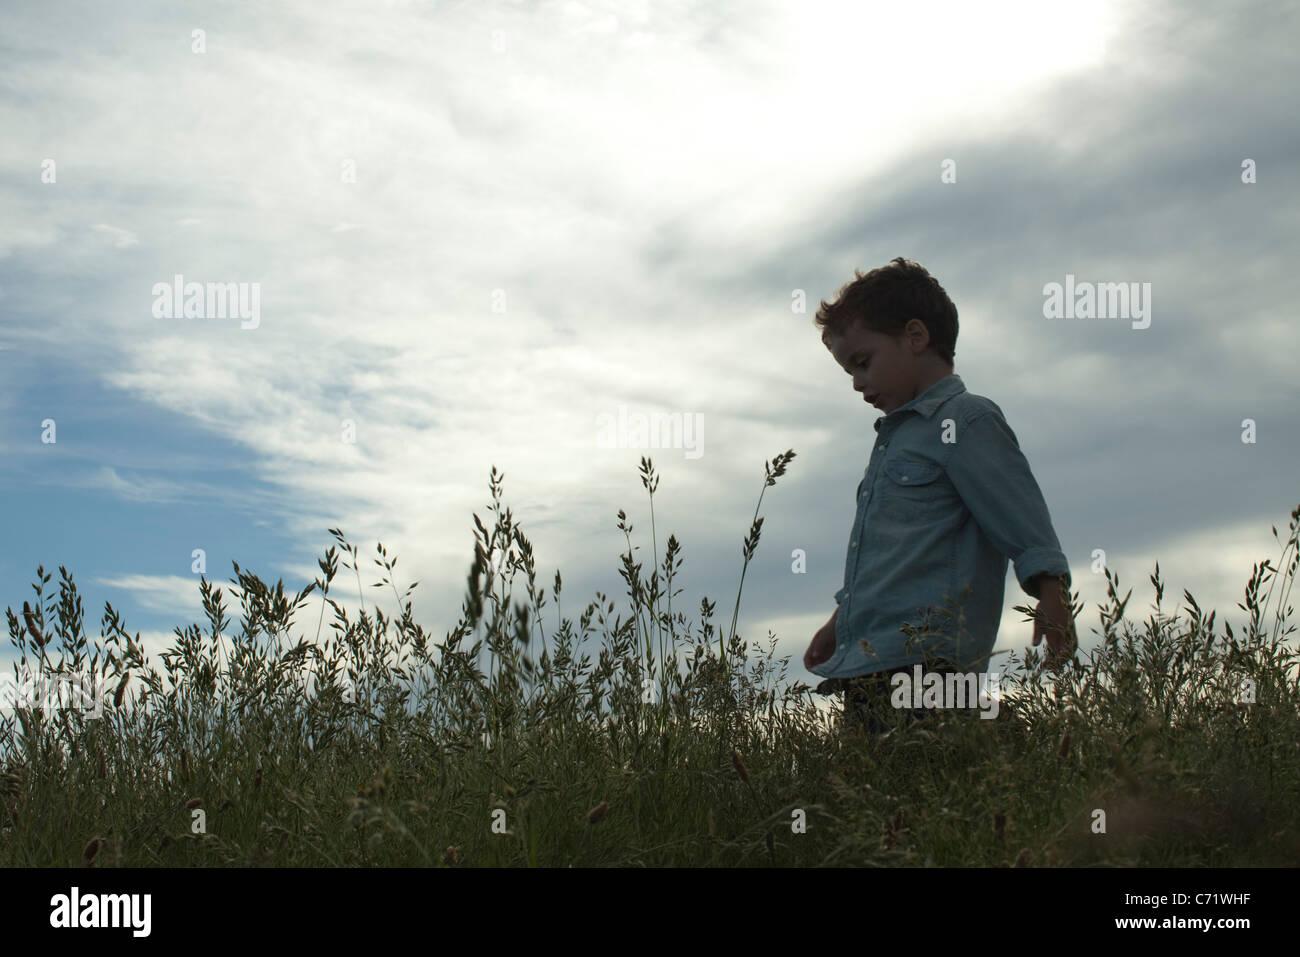 Boy walking through tall grass - Stock Image